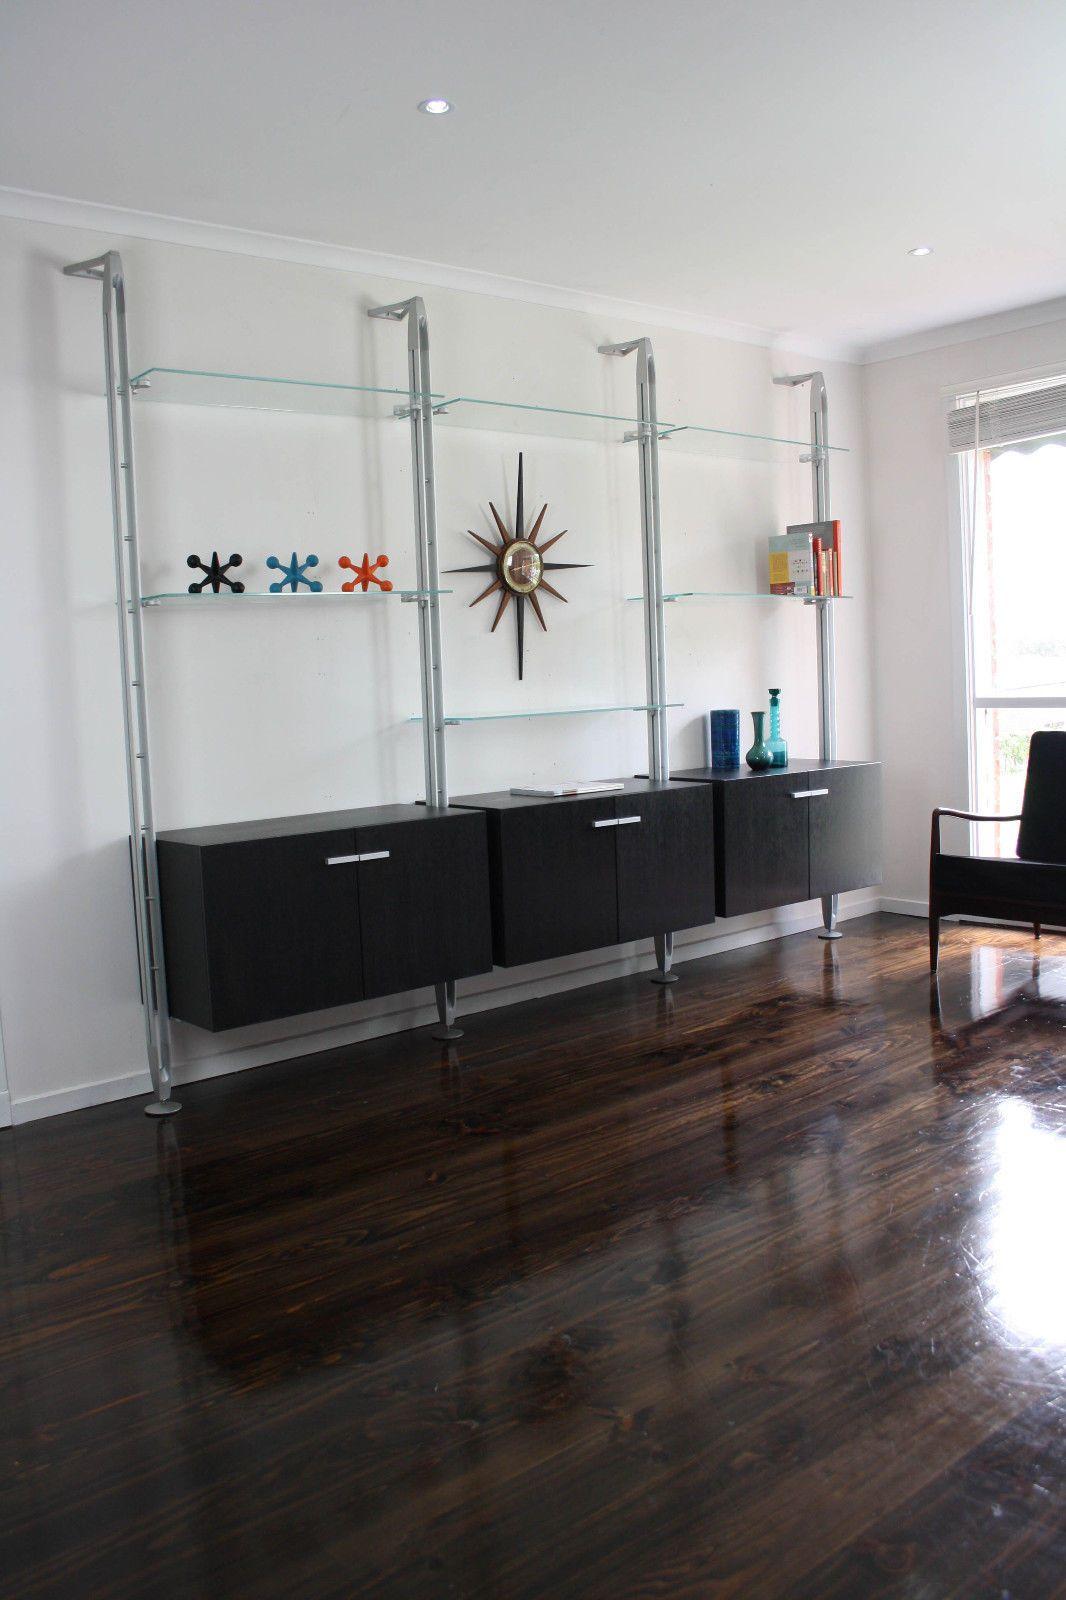 ebay ligne roset topic related to agreeable ligne roset good morning pedestal table chrome. Black Bedroom Furniture Sets. Home Design Ideas